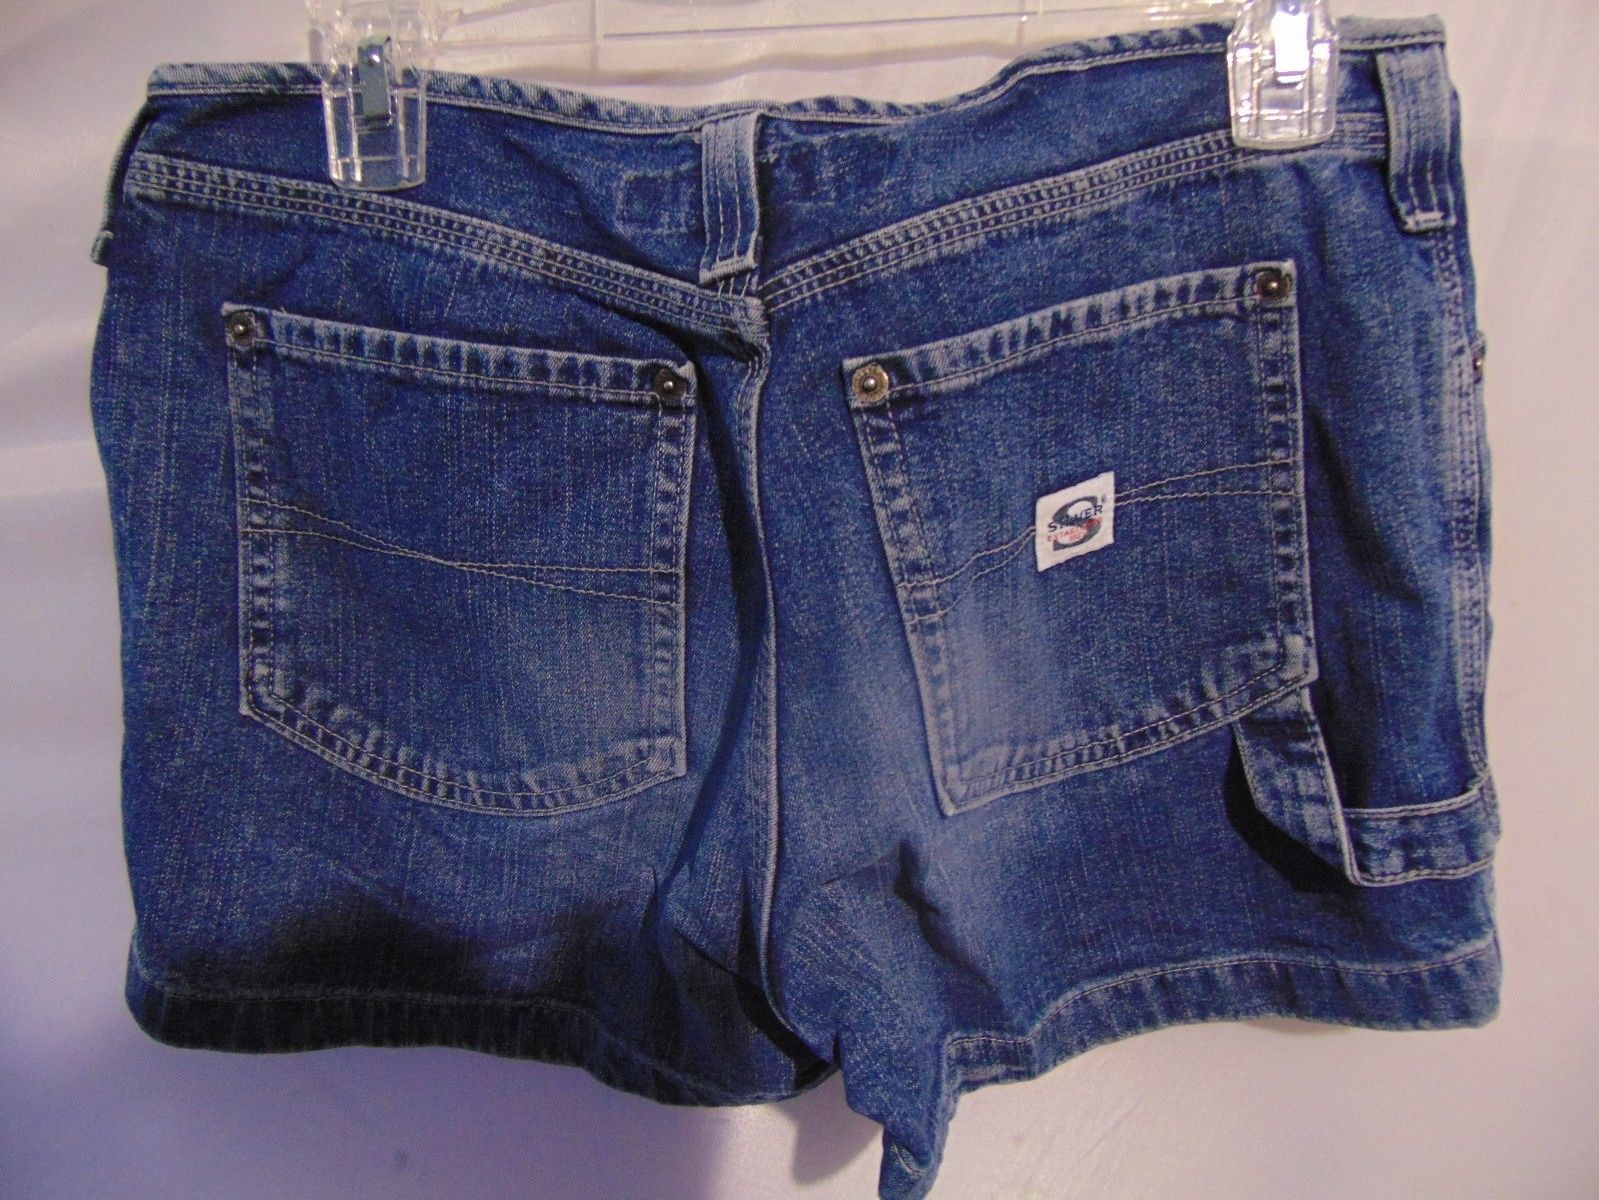 Silver Shorts Sz 30